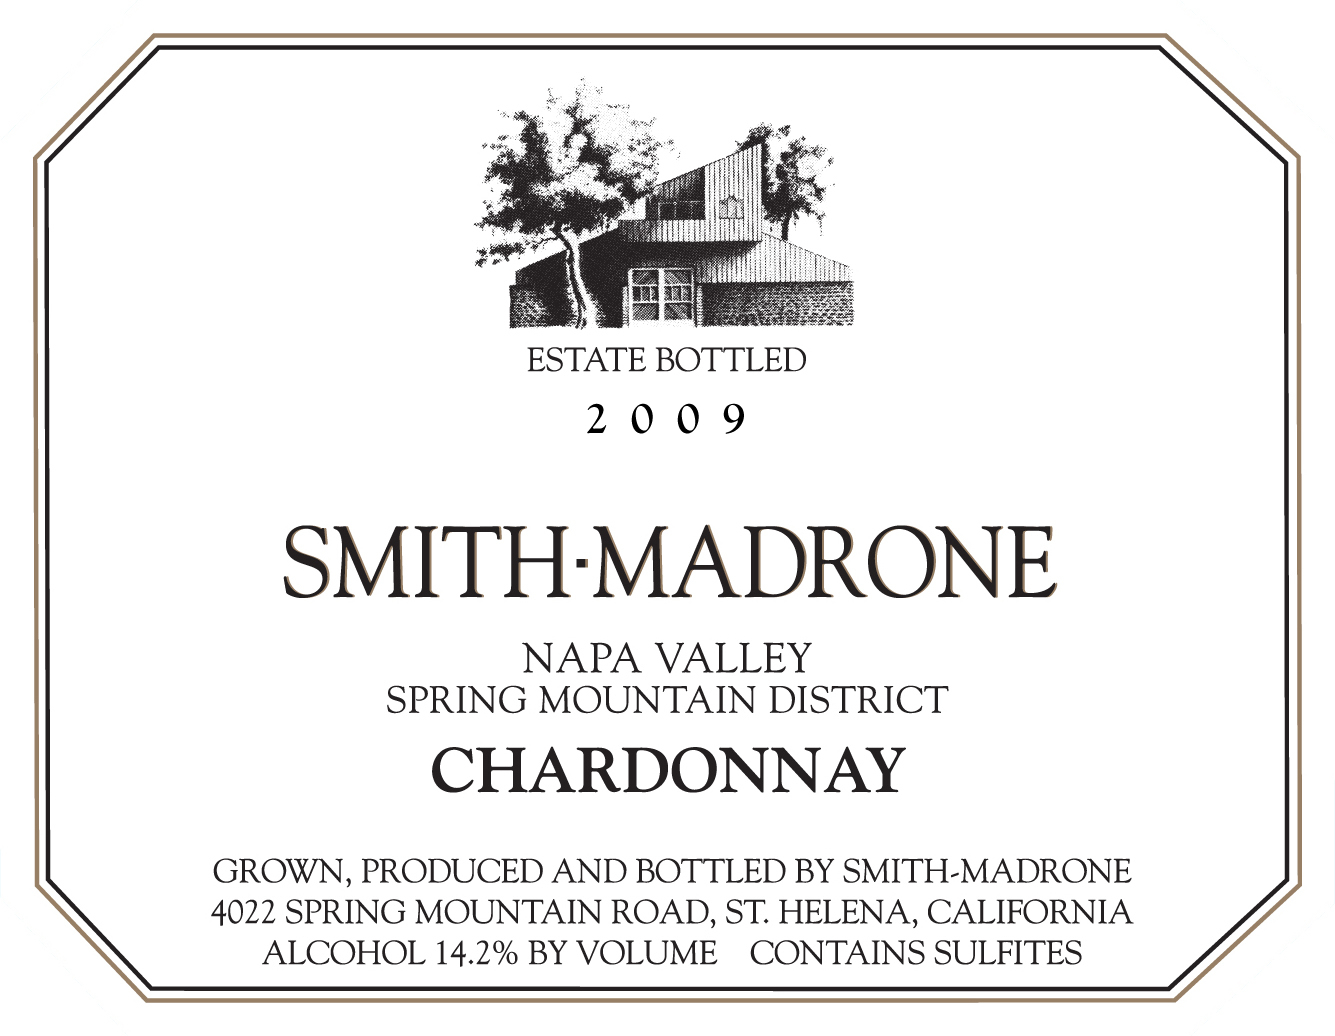 2009 Smith-Madrone Napa Valley Chardonnay